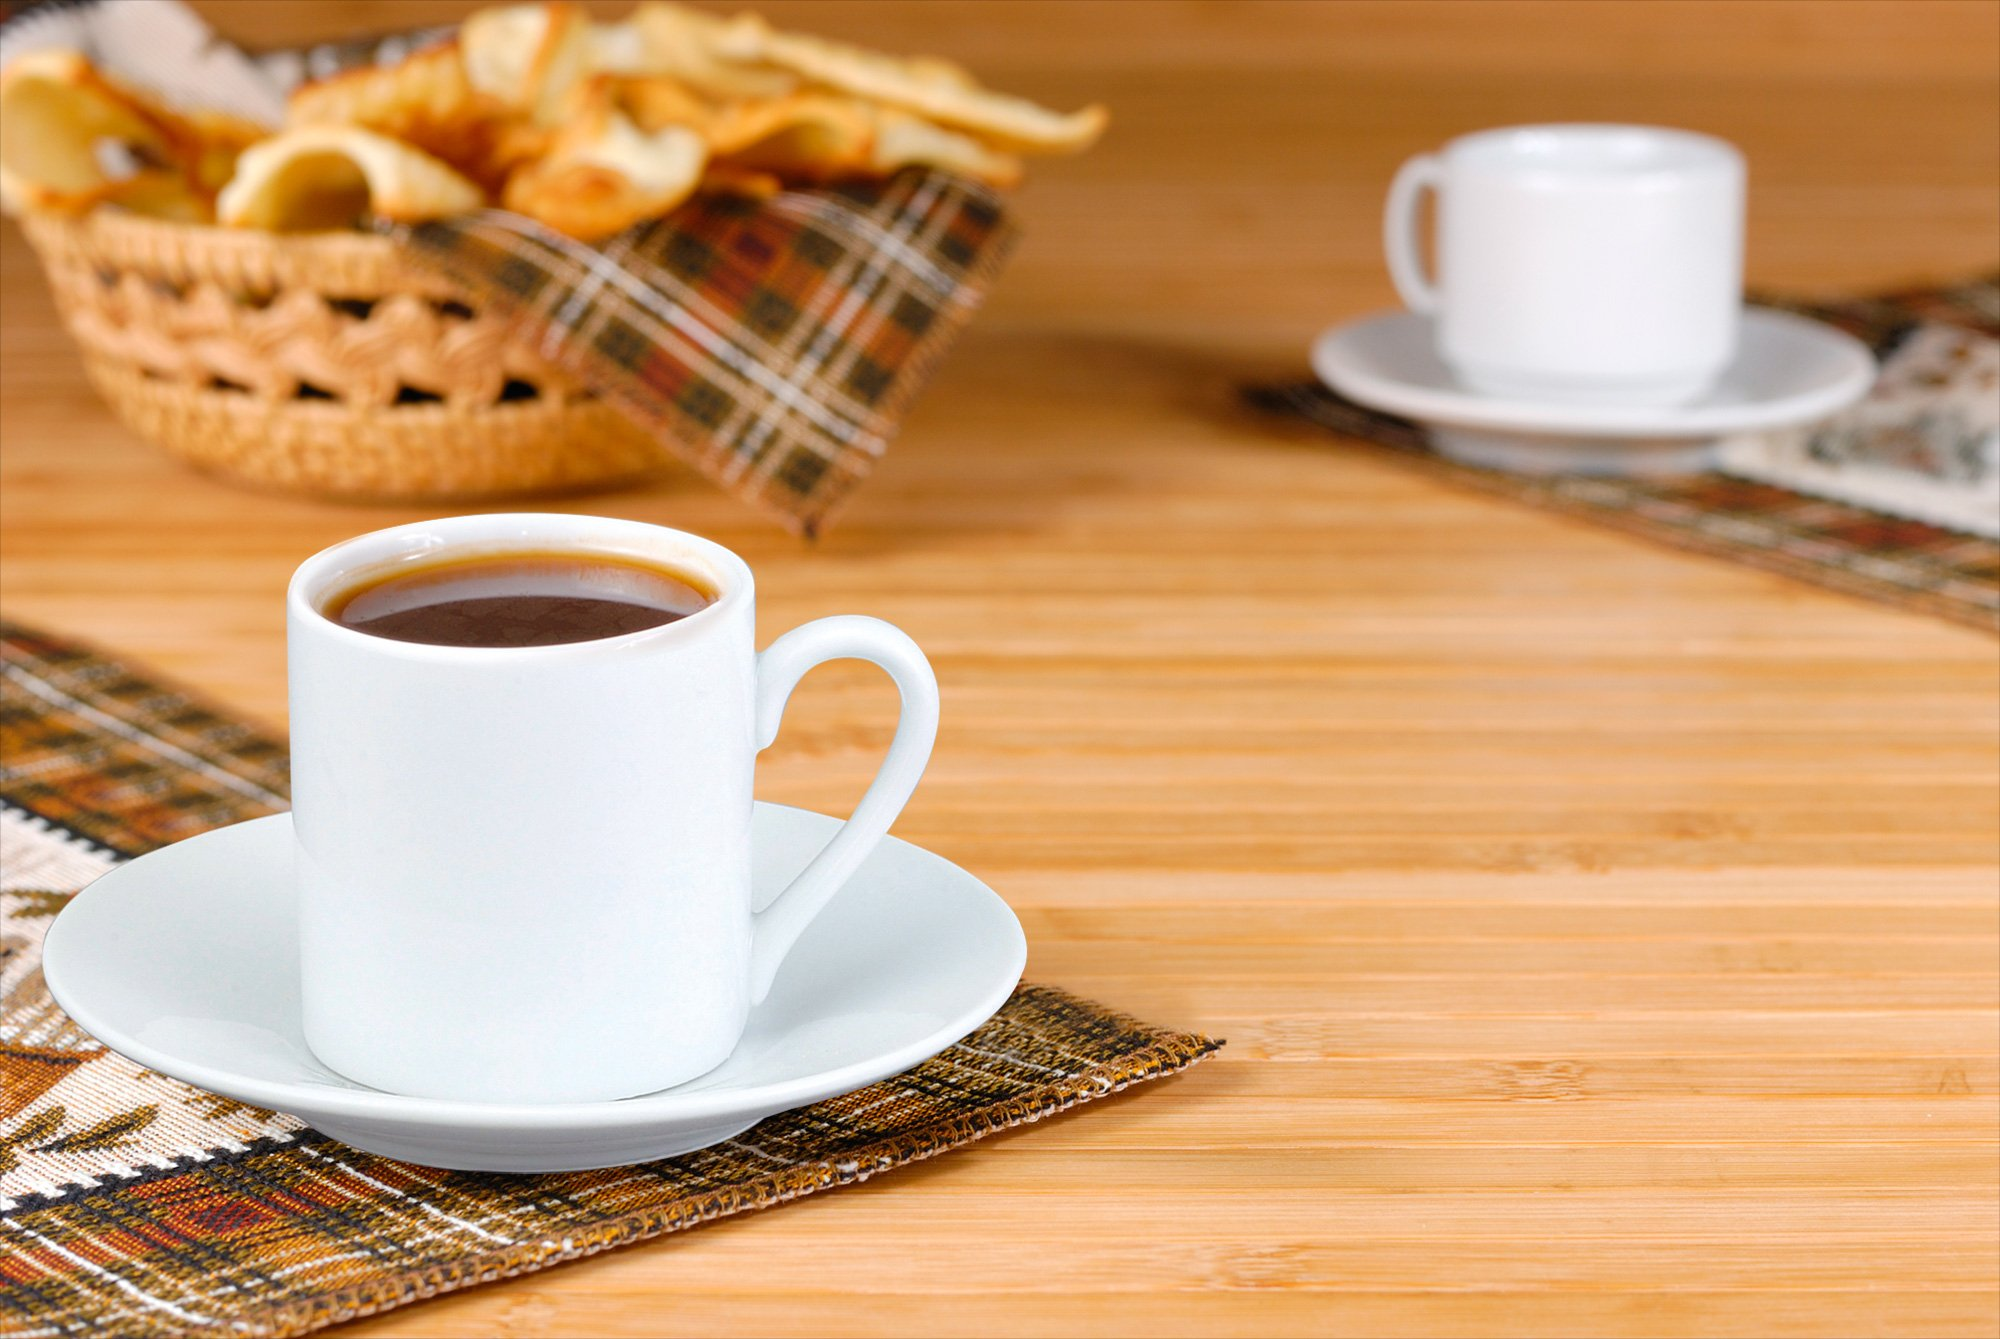 HIC 8-Piece Demitasse Espresso Cups Set, Fine White Porcelain, Set Includes 4 Cups with Matching Saucers, 2.25-Ounces